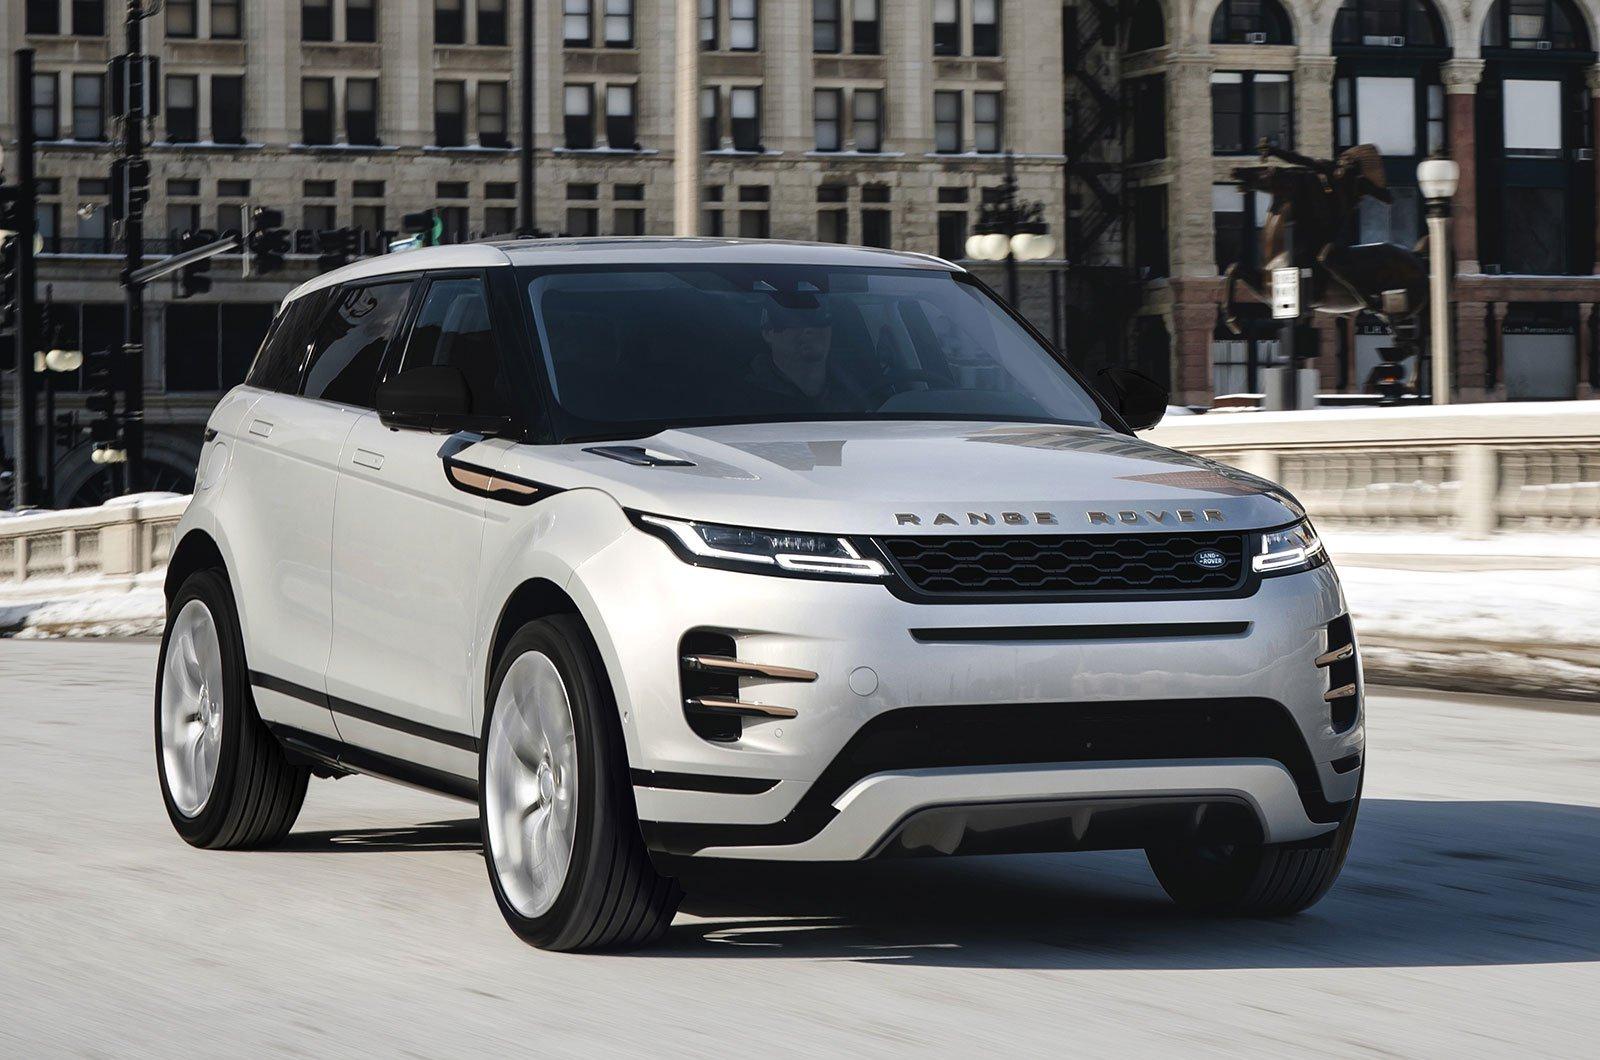 Range Rover Evoque Model Year 2021 front